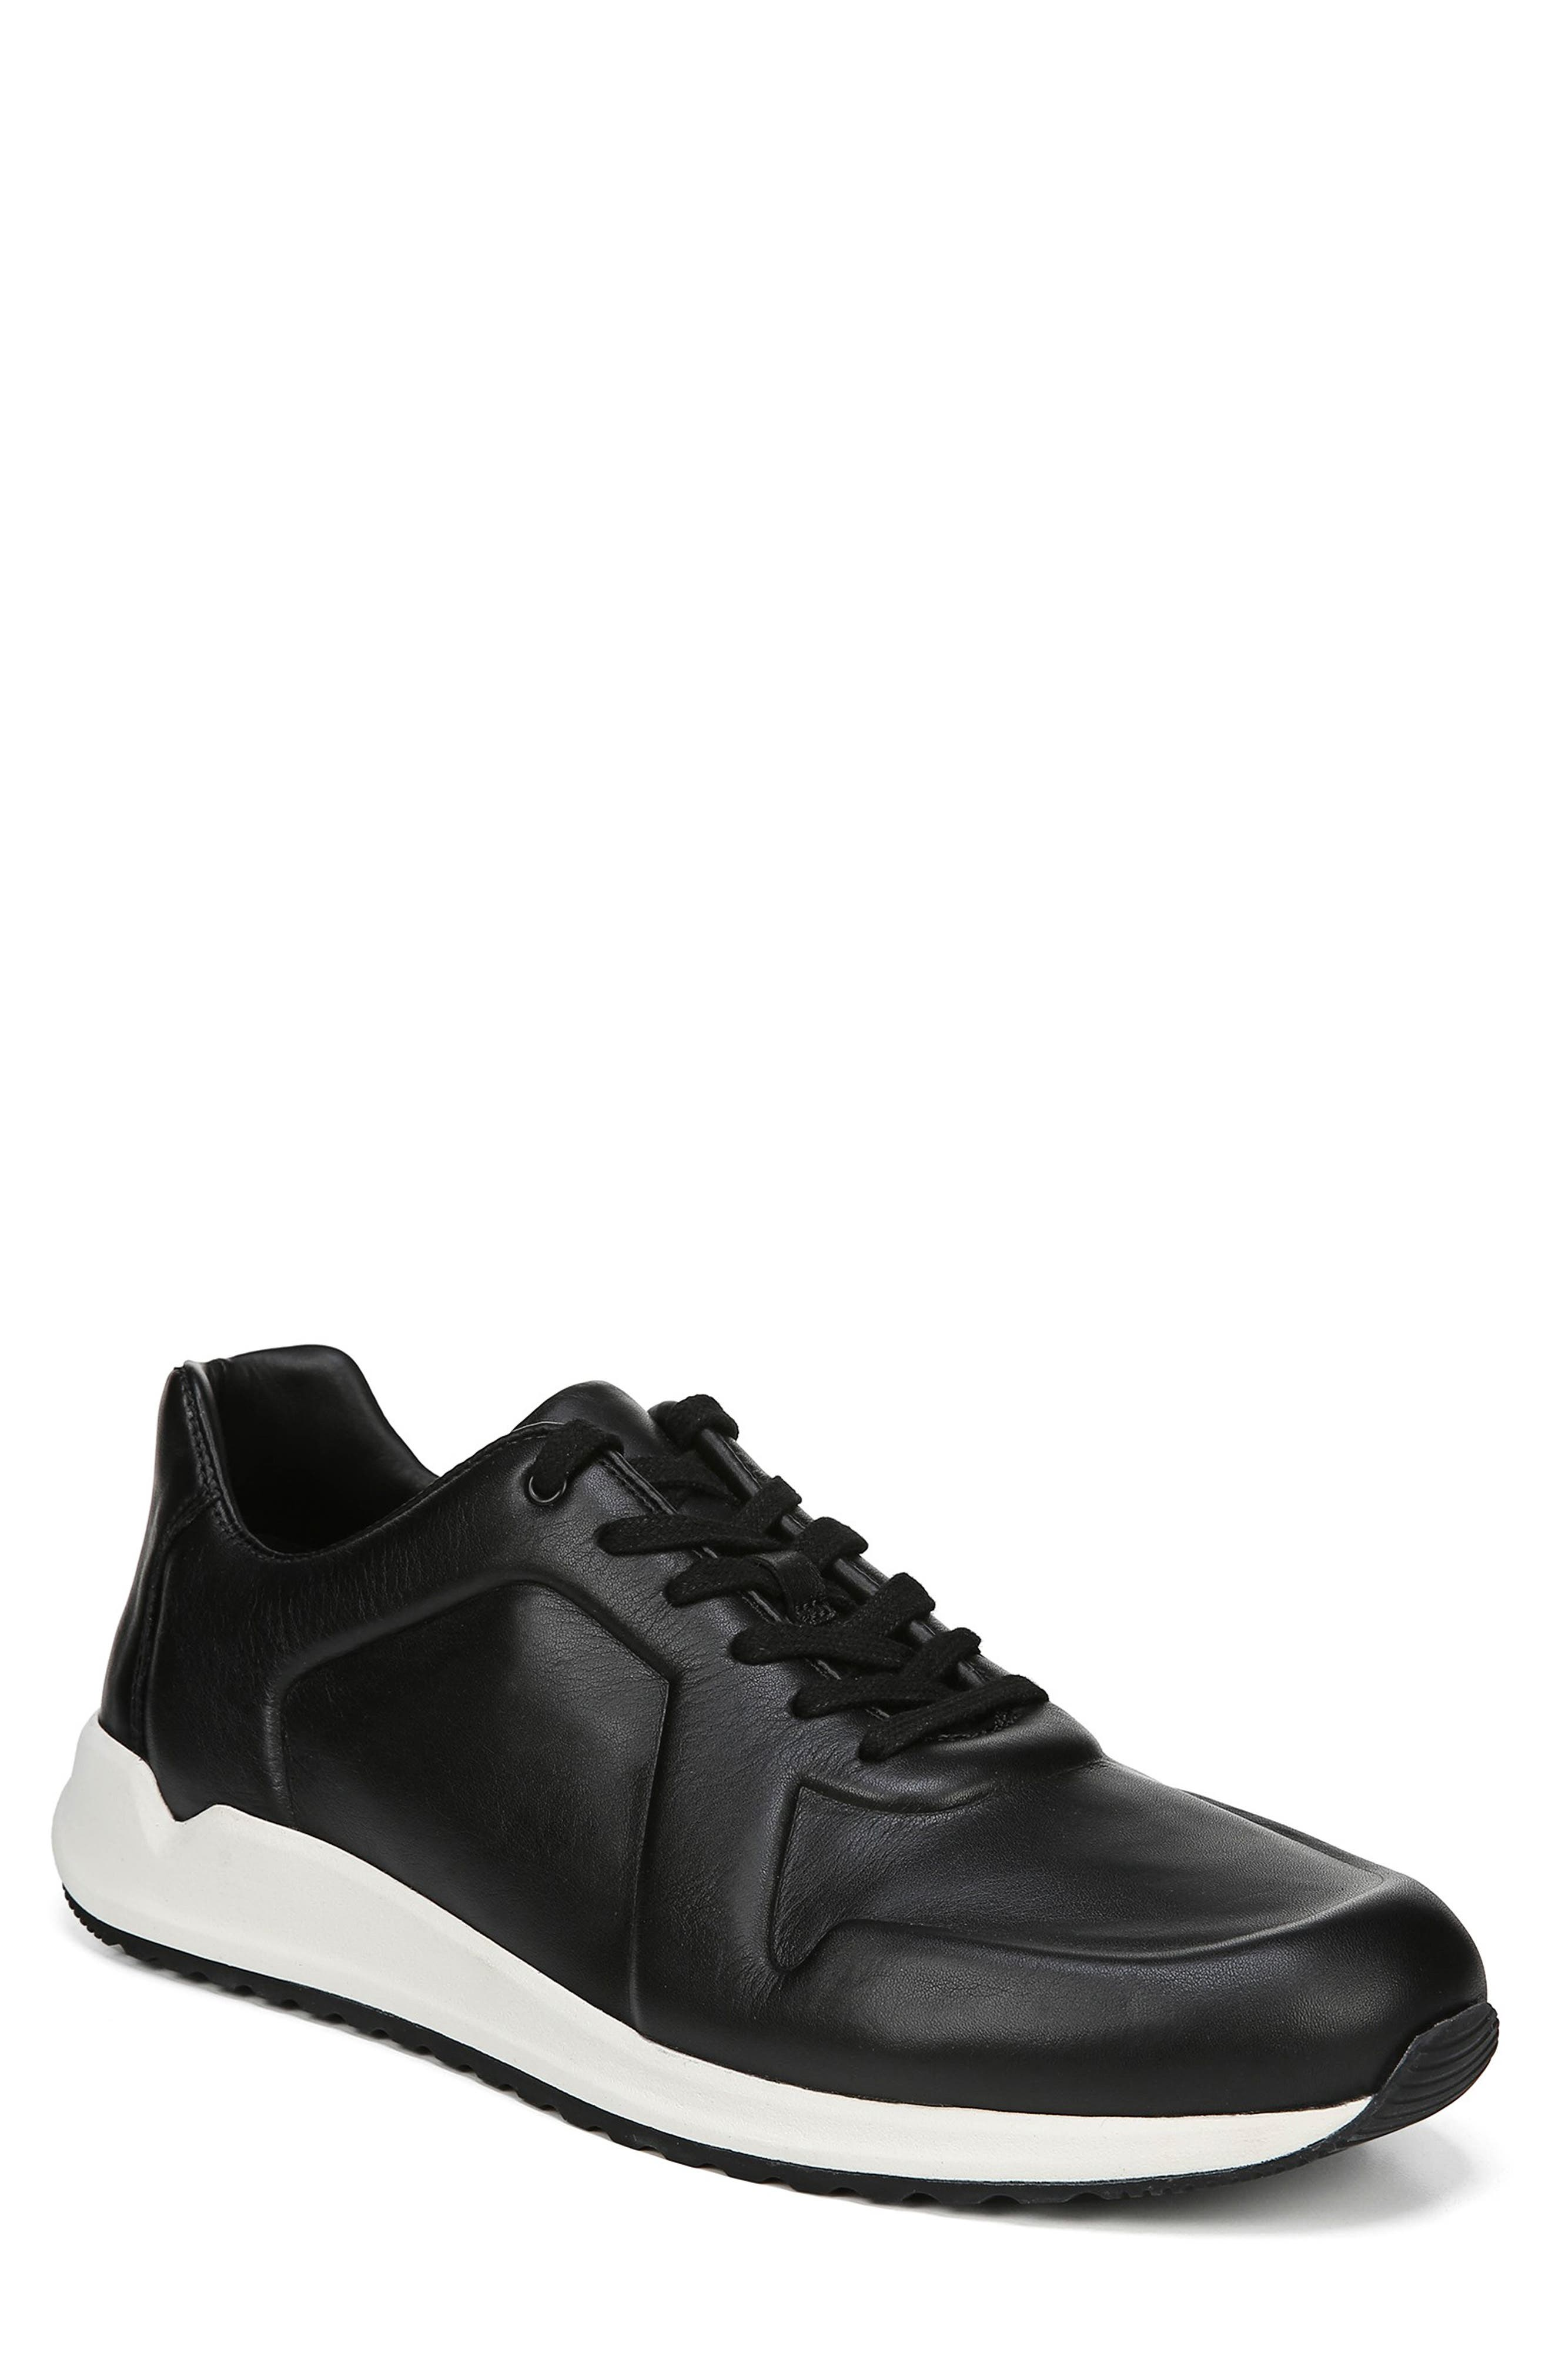 Garrett Sneaker,                         Main,                         color, BLACK/ BLACK